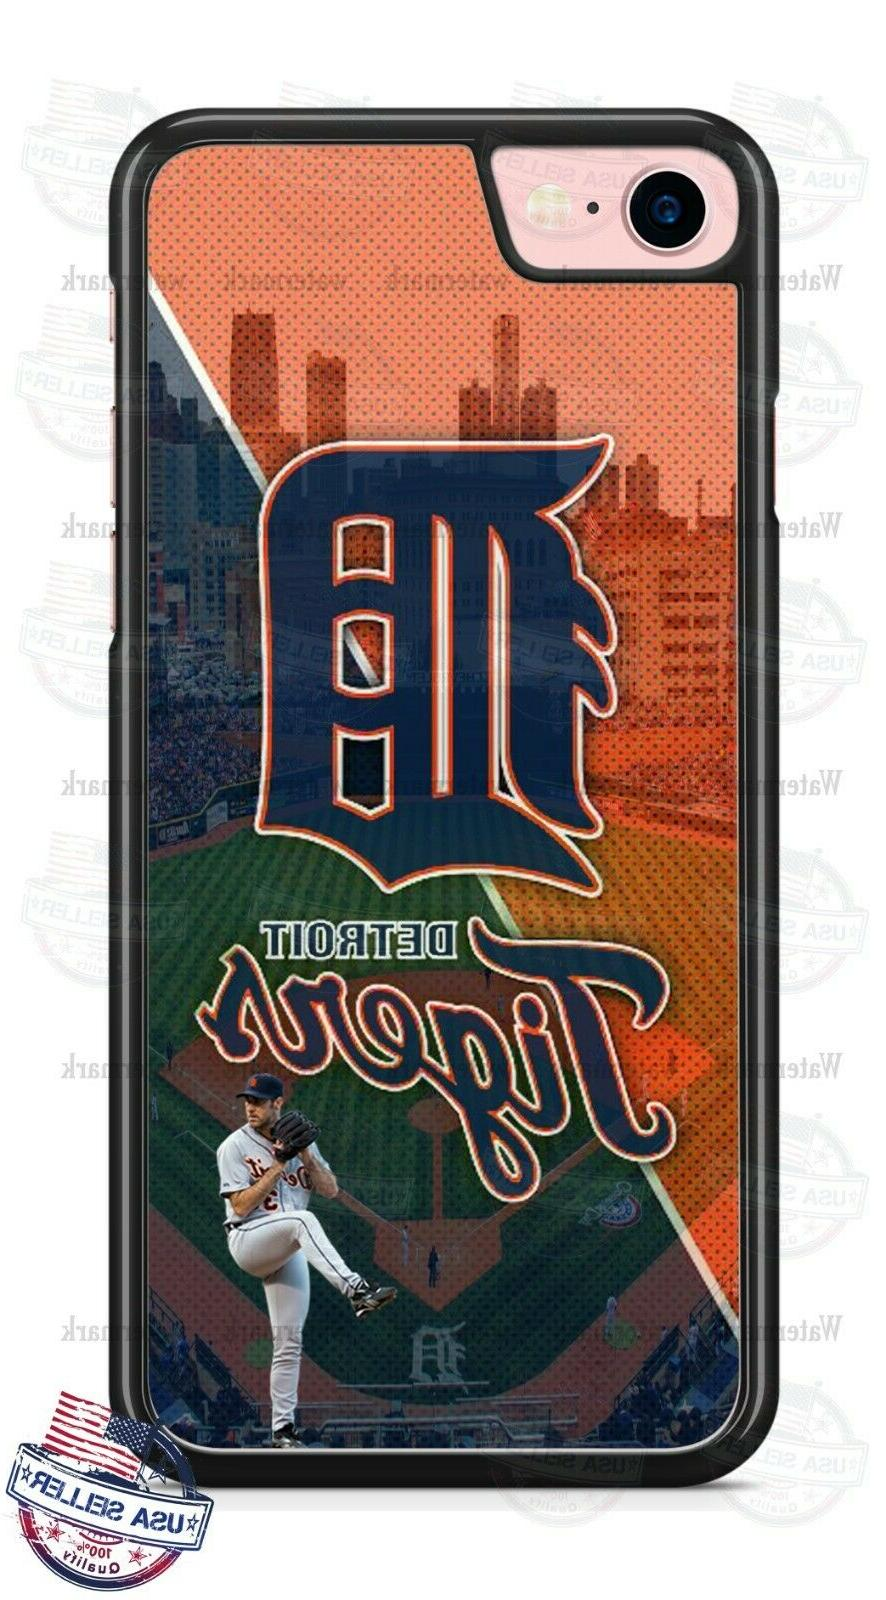 detroit tigers baseball stadium phone case cover